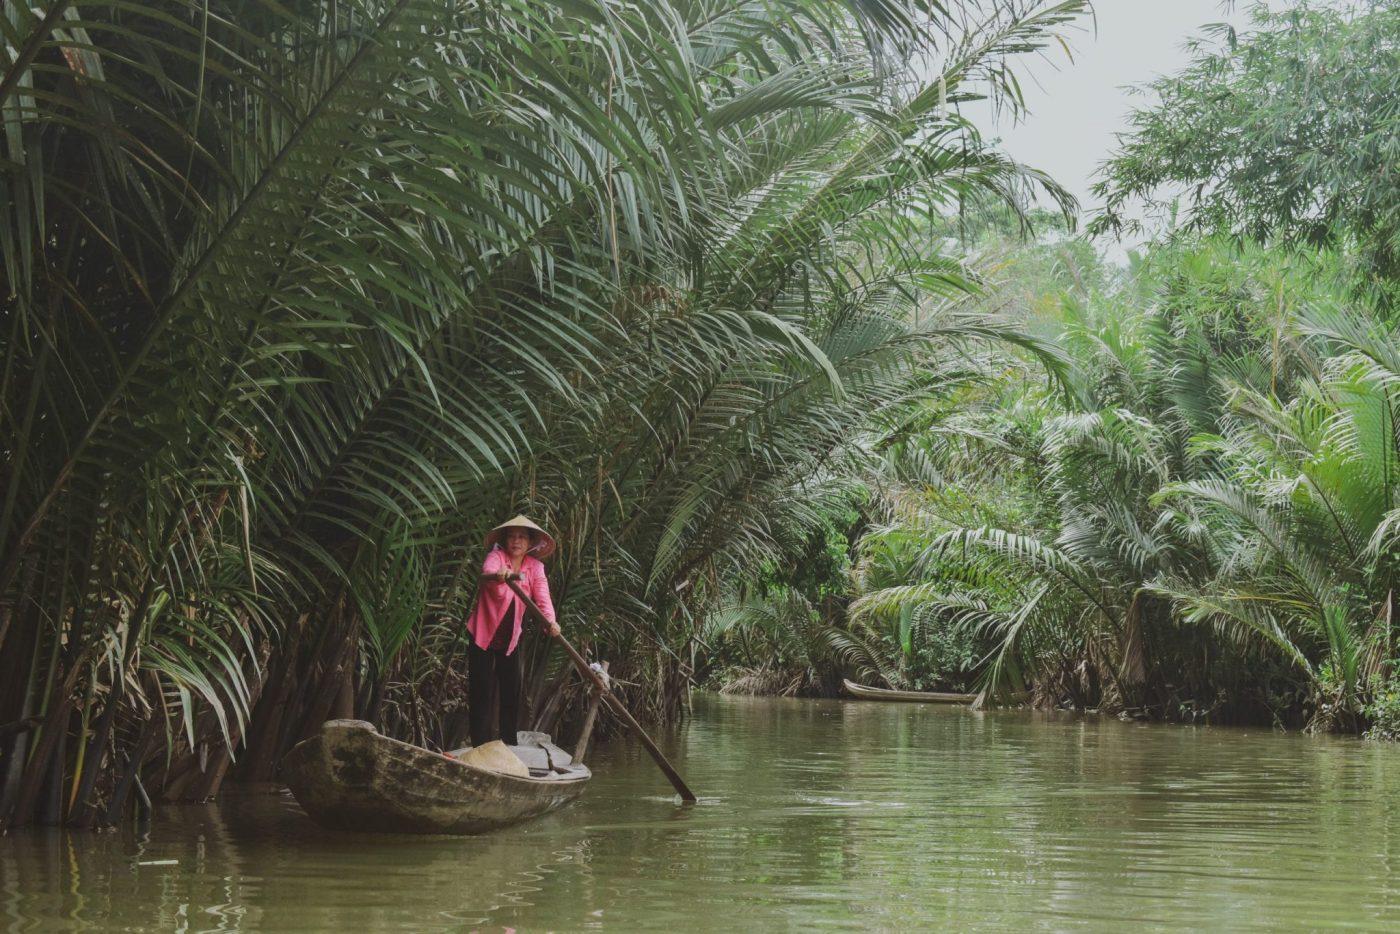 A woman rowing down a tropical river, Vietnam